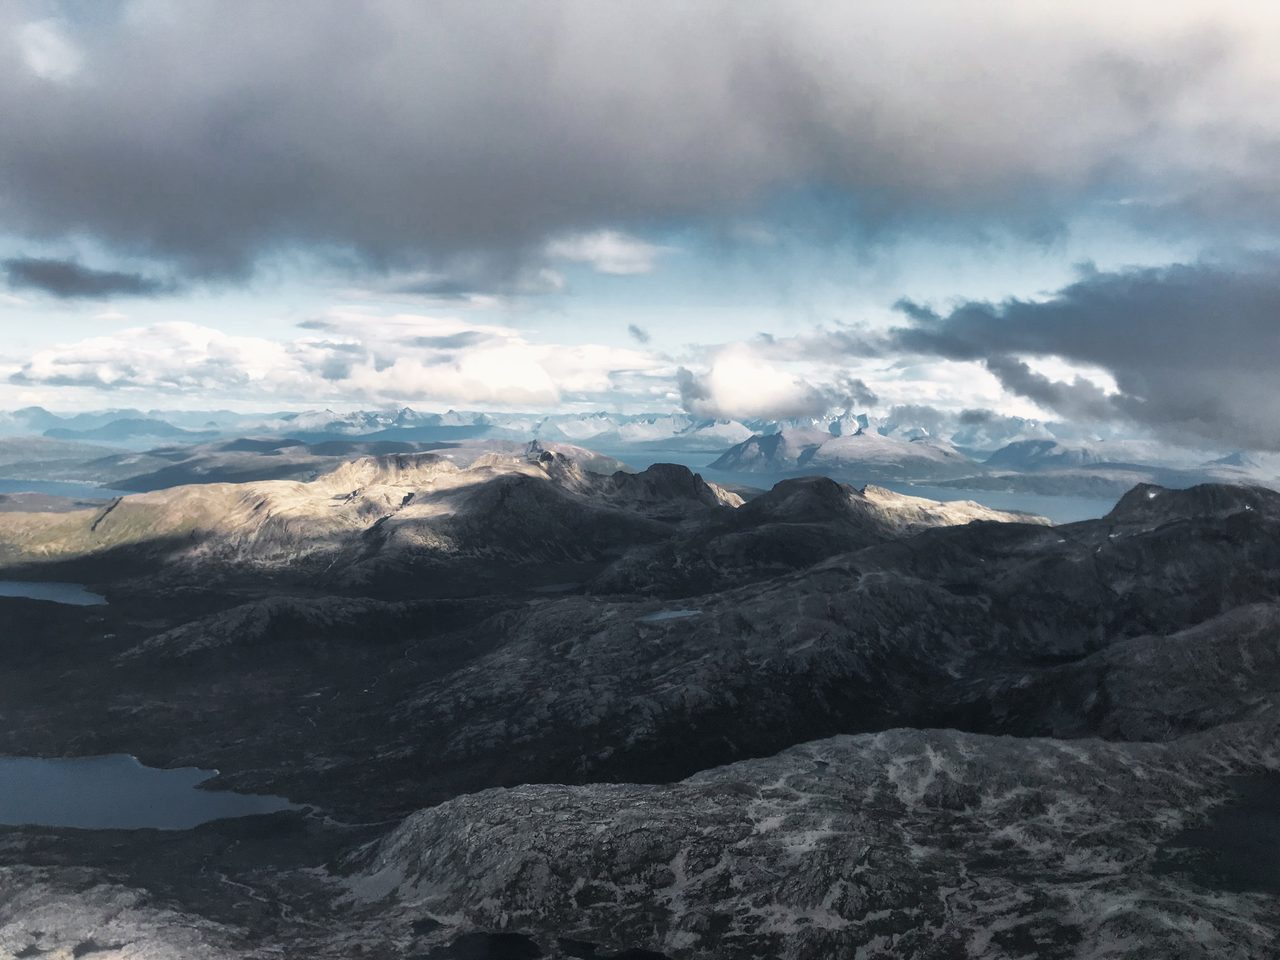 Cloud, Sky, Atmosphere, Mountain, Sunlight, Highland, Cumulus, Horizon